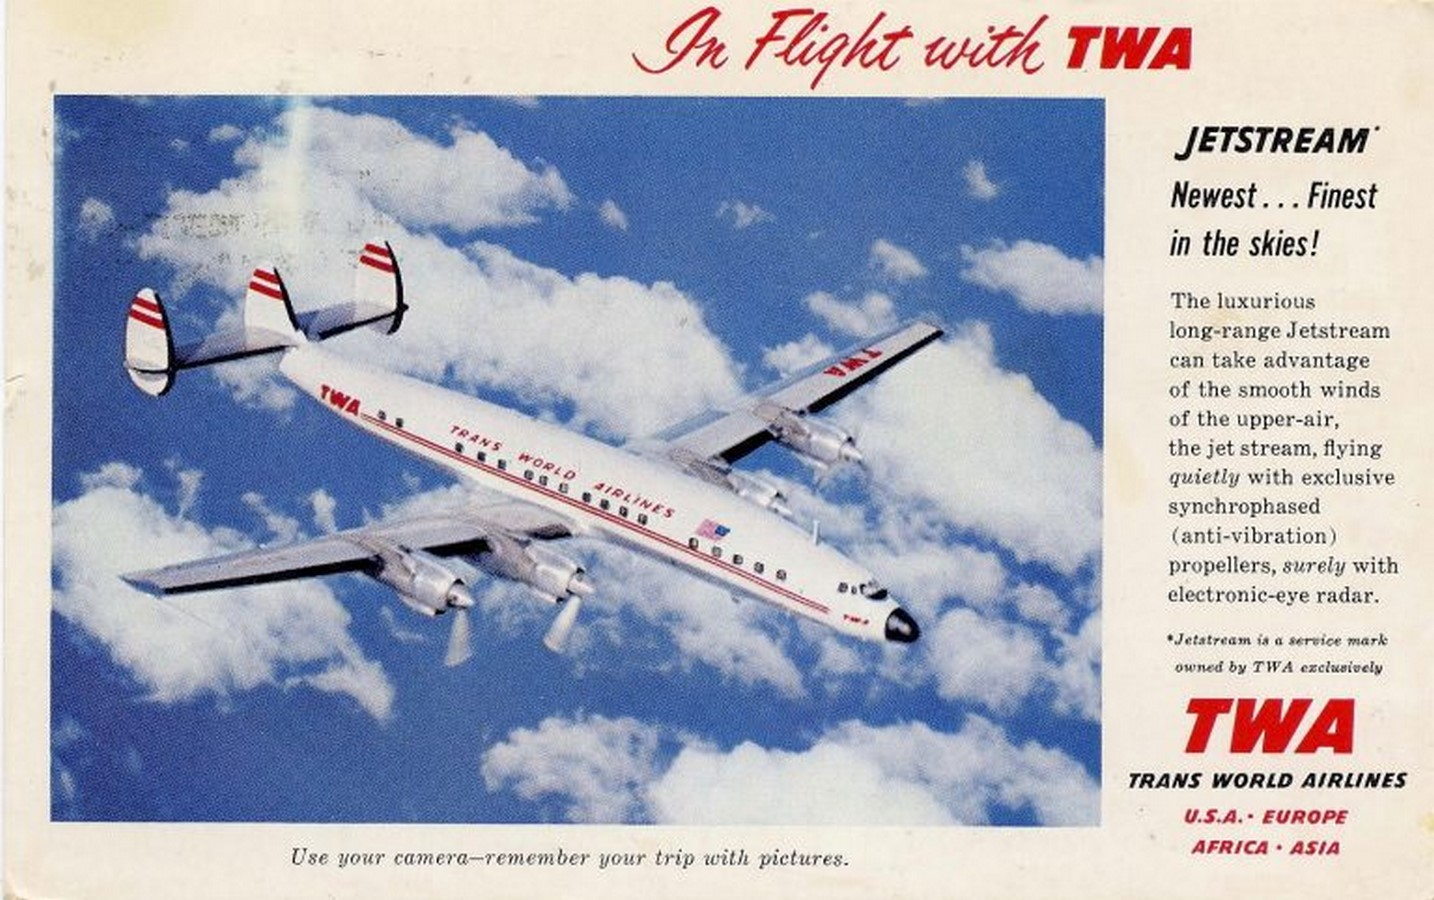 TWA Flight Centre, New York by Eero Saarinen: Capturing the Spirit of Flight - Sheet1